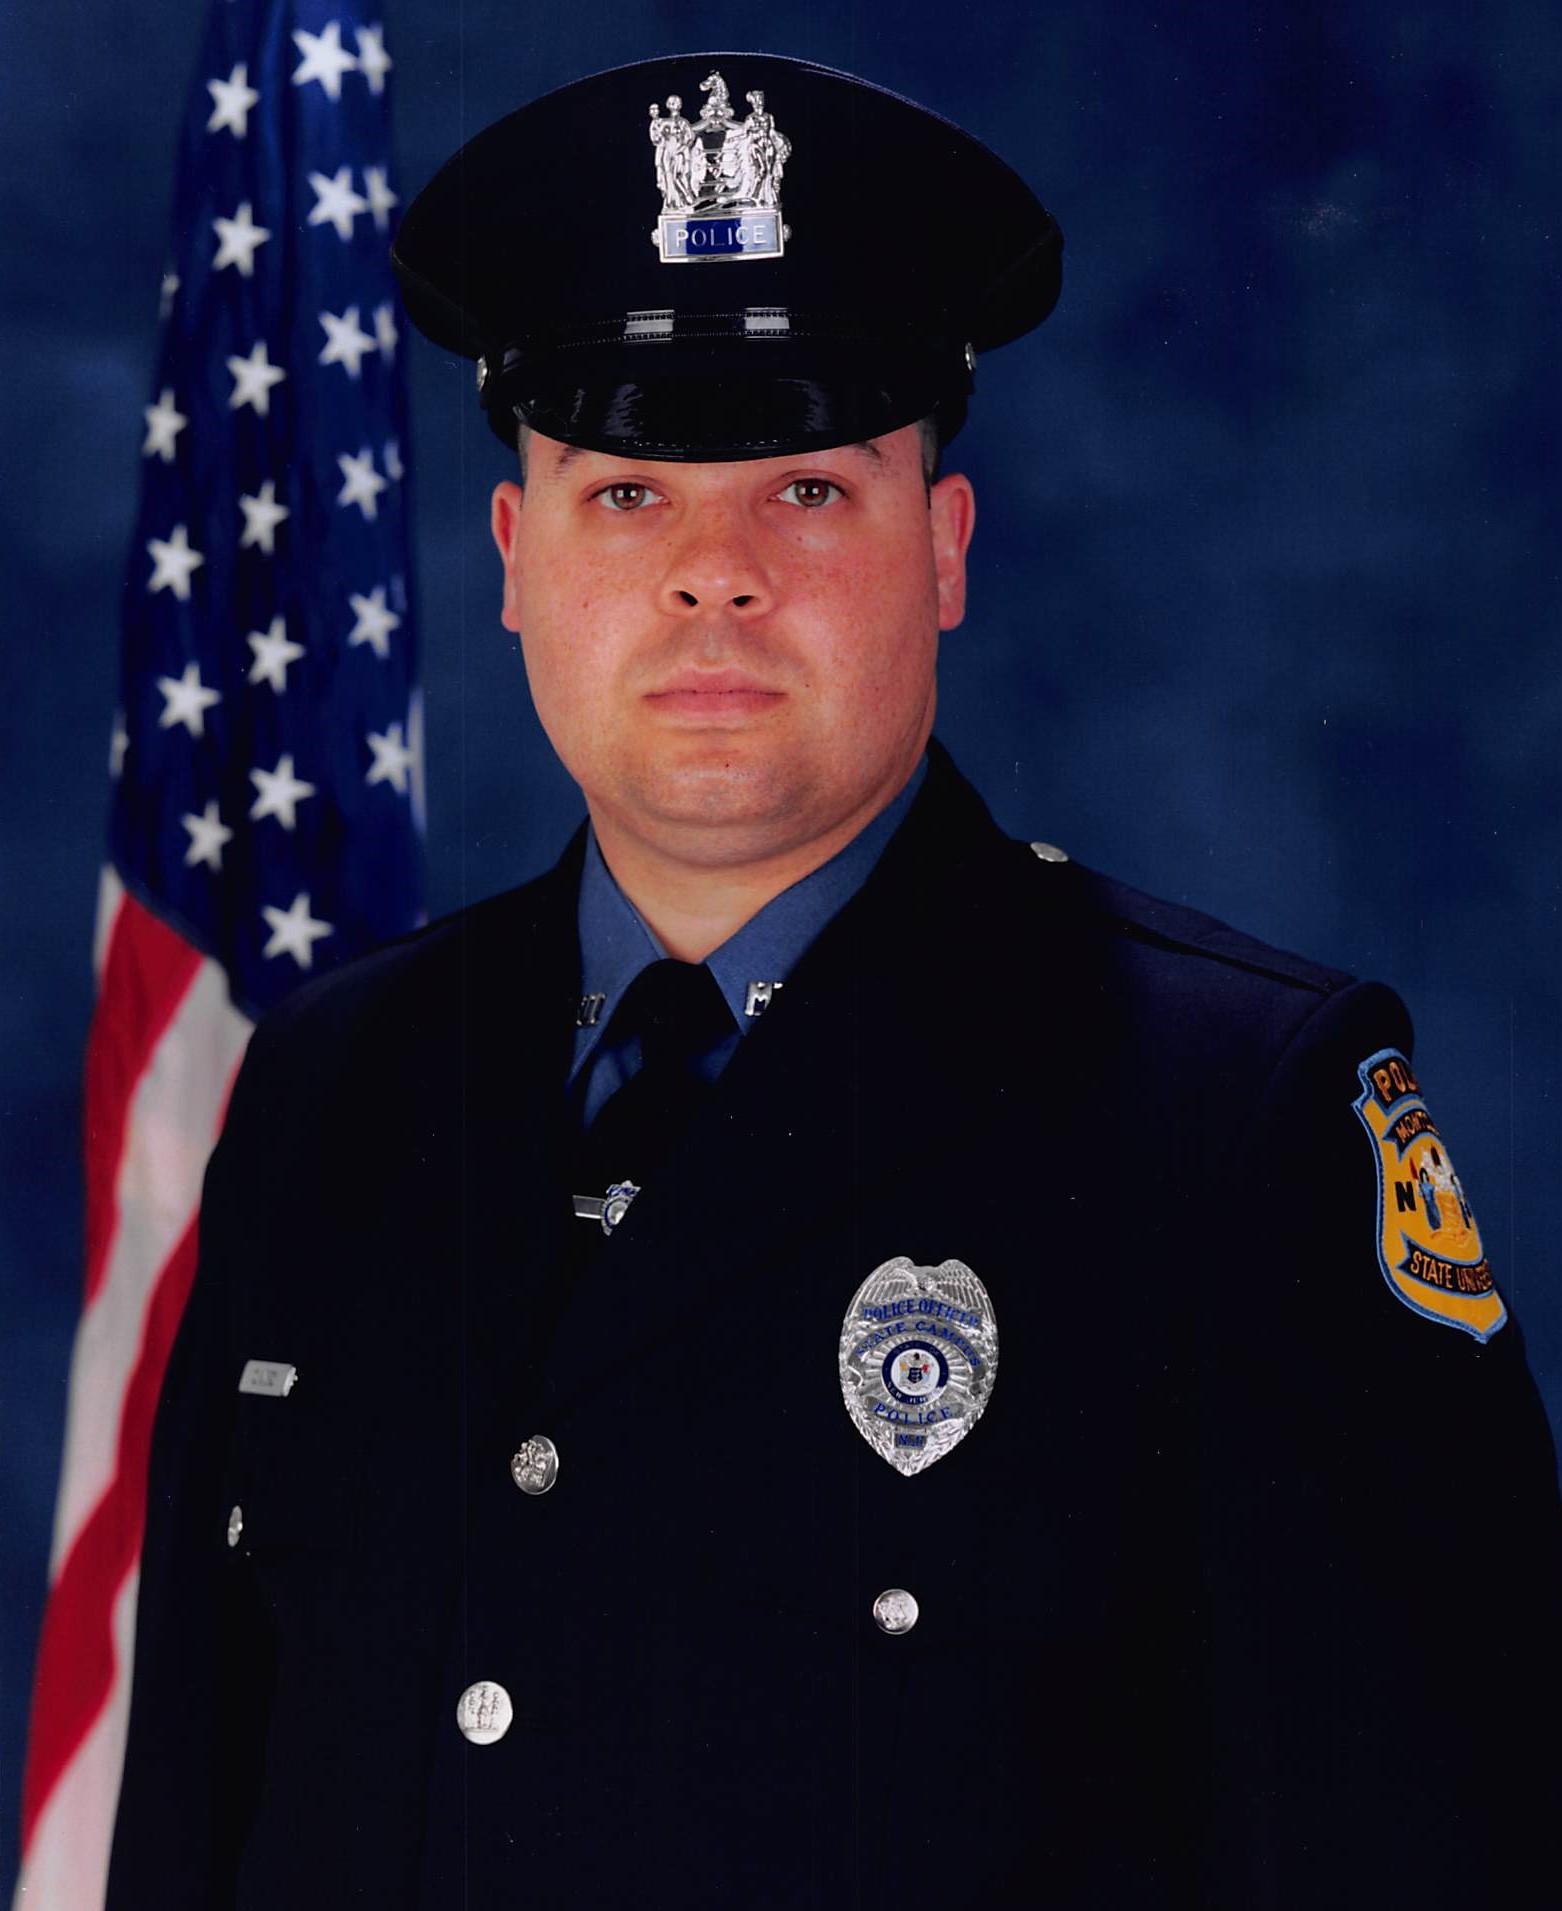 Sergeant Christopher A. Vidro | Montclair State University Police Department, New Jersey